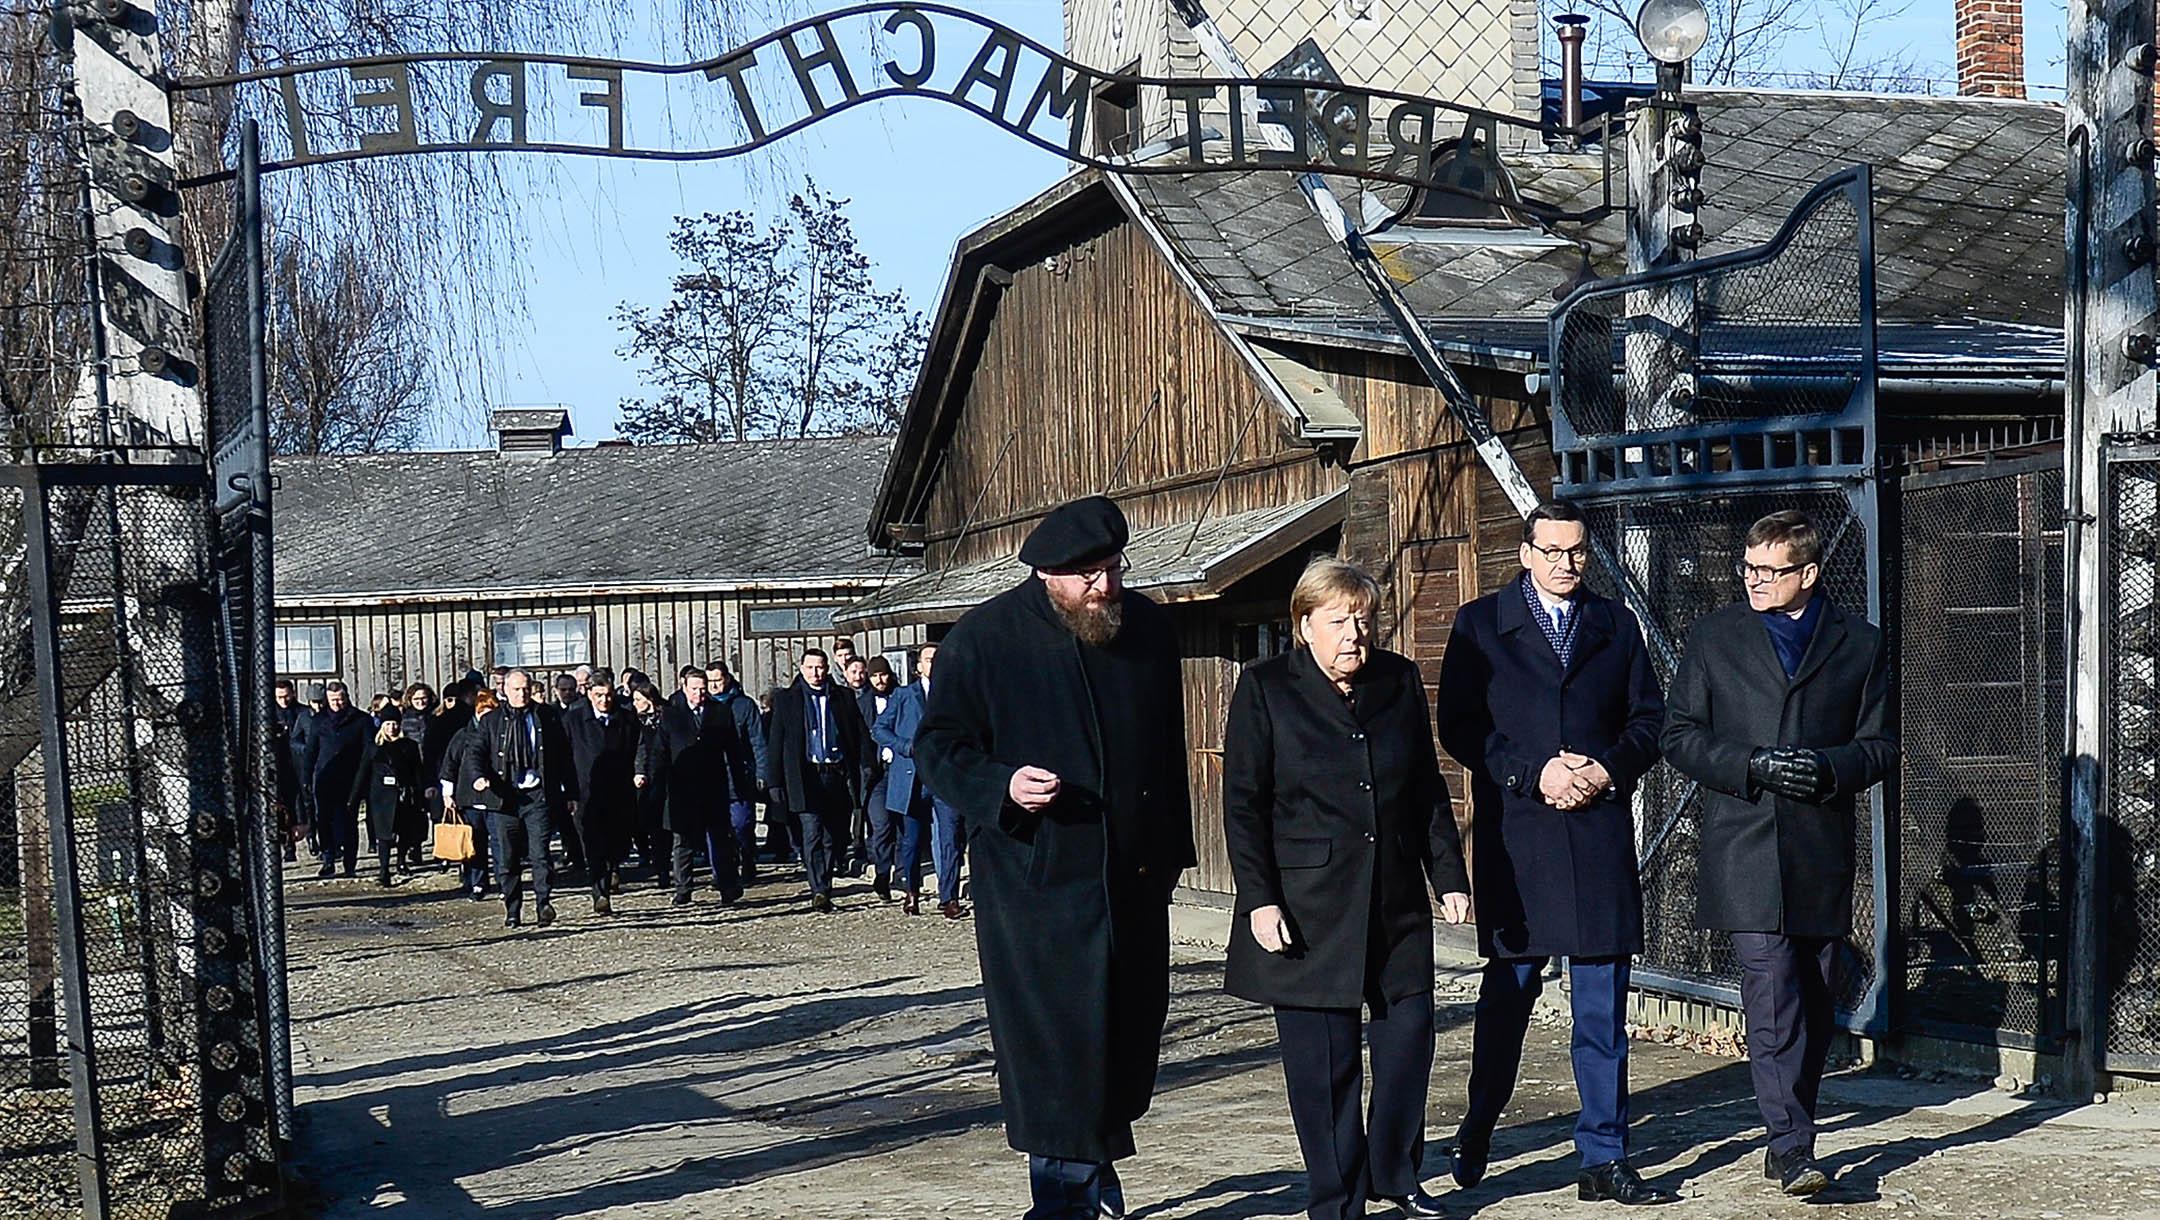 Angela Merkel announces Germany will donate $66 million to Auschwitz museum - Jewish Telegraphic Agency